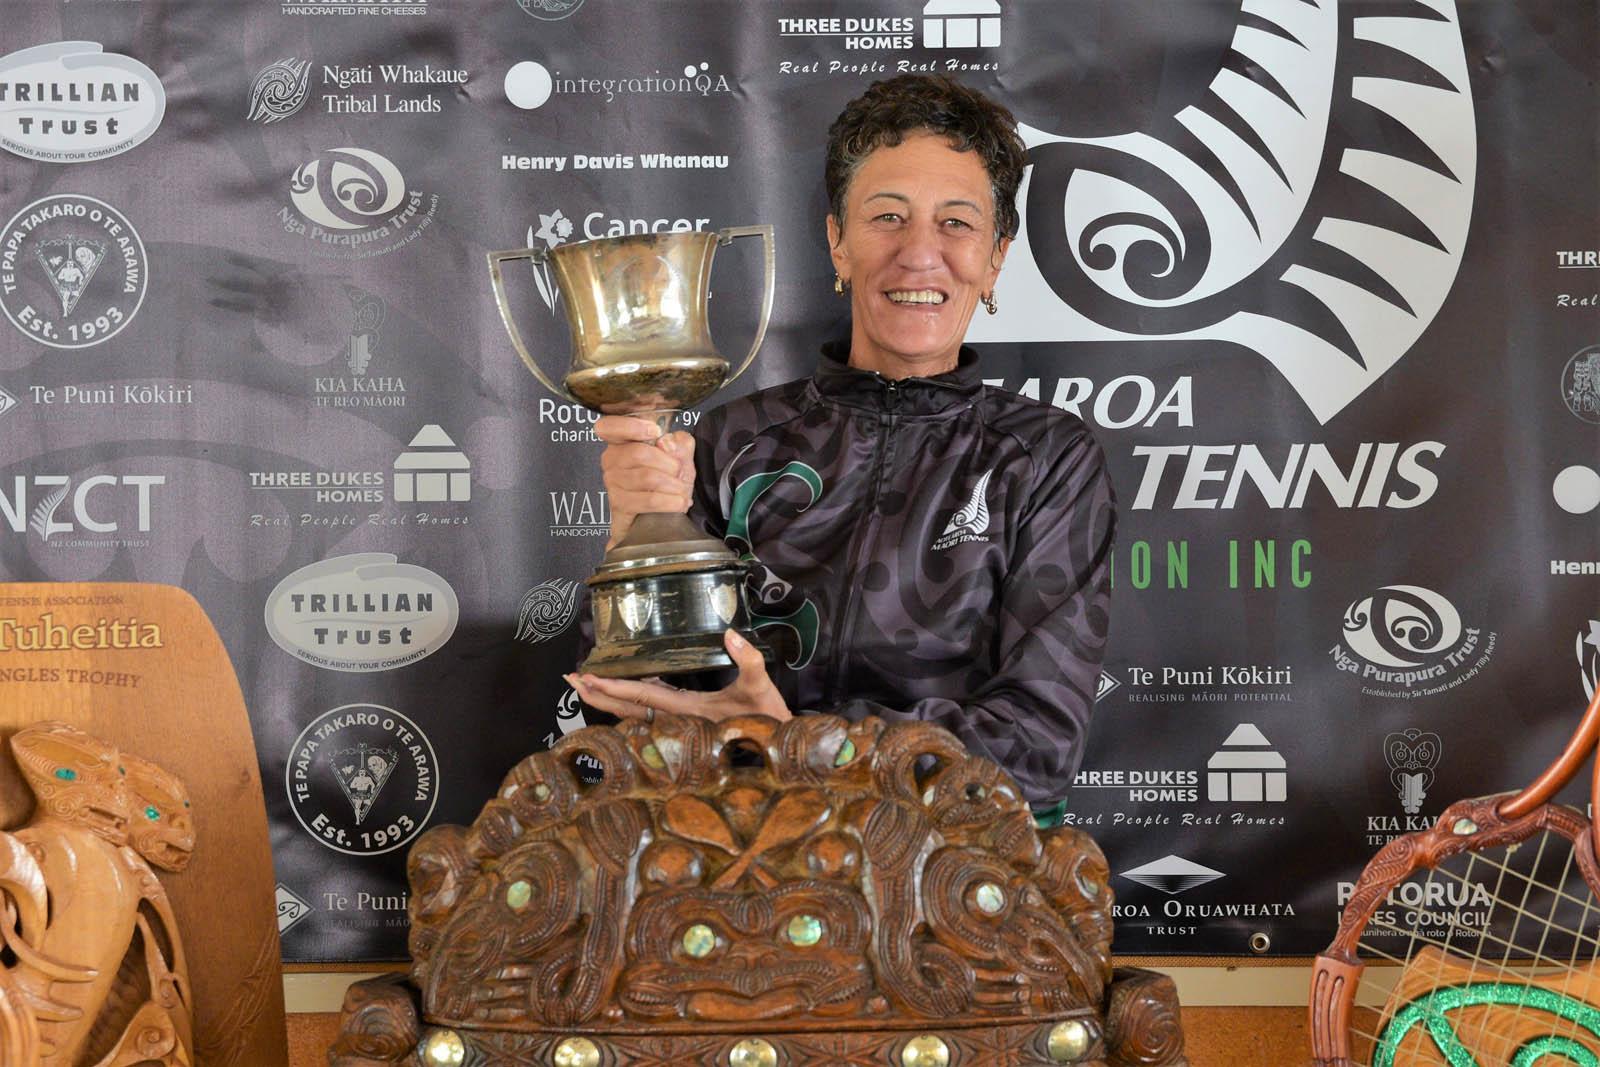 Ngāti Whakaue Tribal Lands Ltd 50-59 Womens Singles Winner Leona Bette Kaye-Ivitu